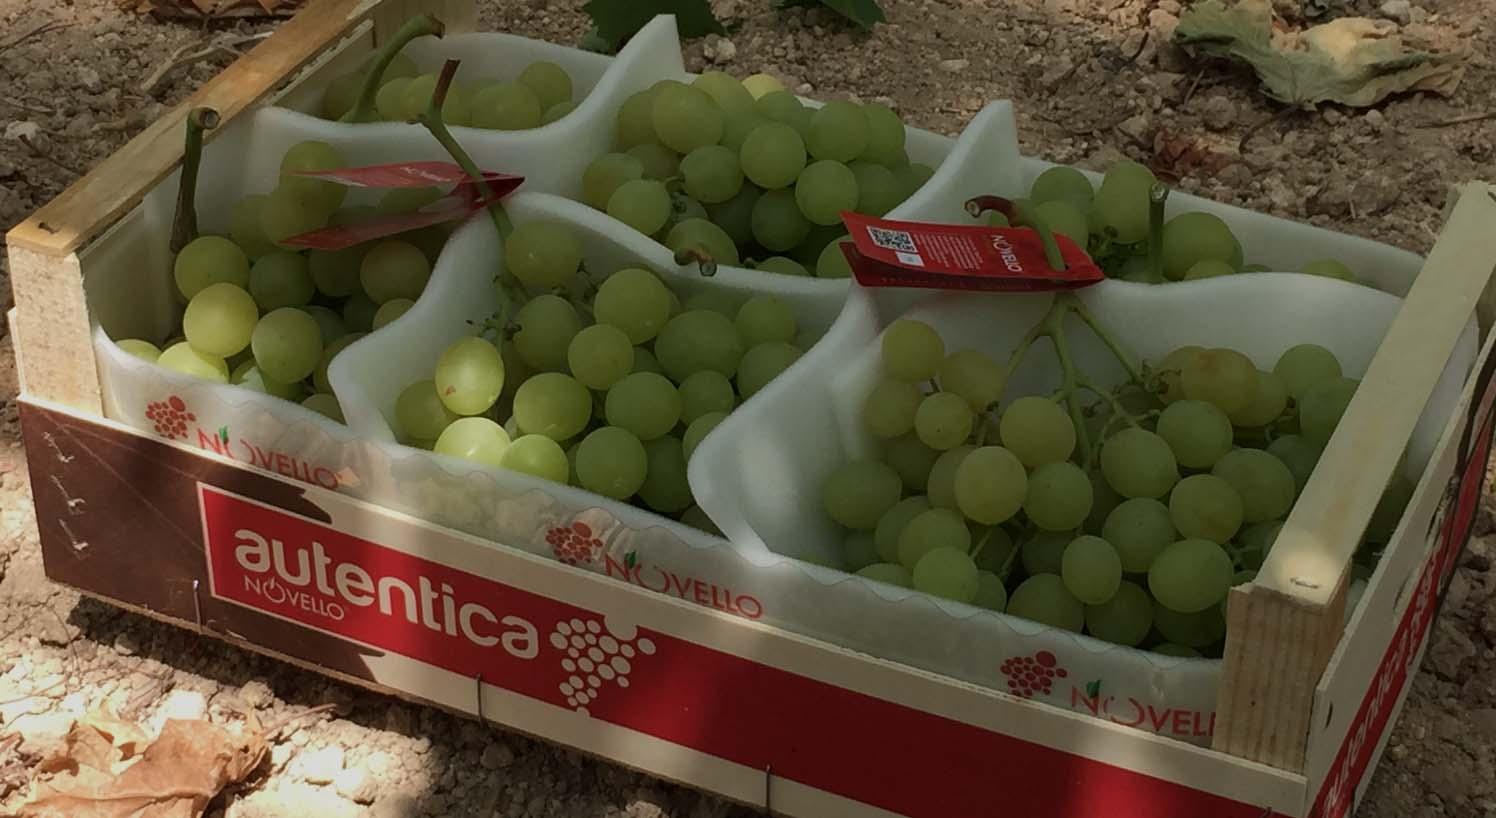 Novello Autentica uva Italia